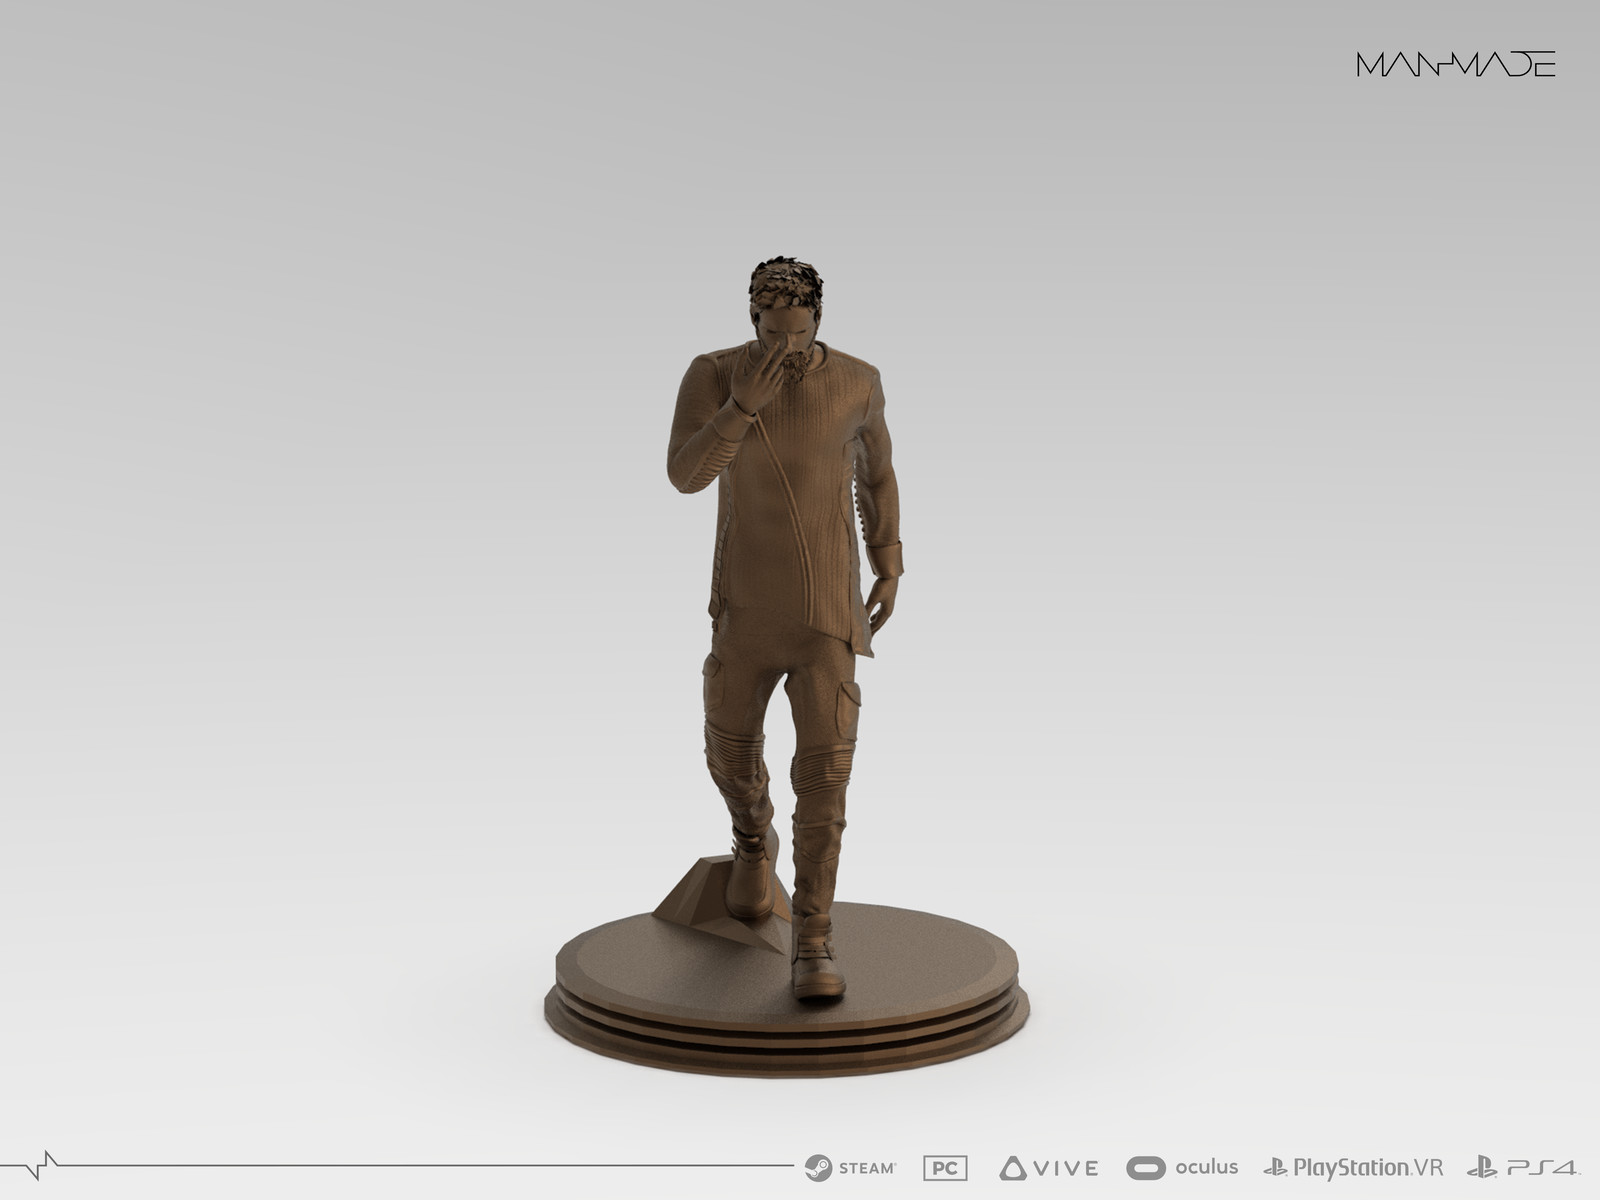 William Kaan Statue Design for Kickstarter Reward for ManMade: SciFi Action Adventure Game (15cm)